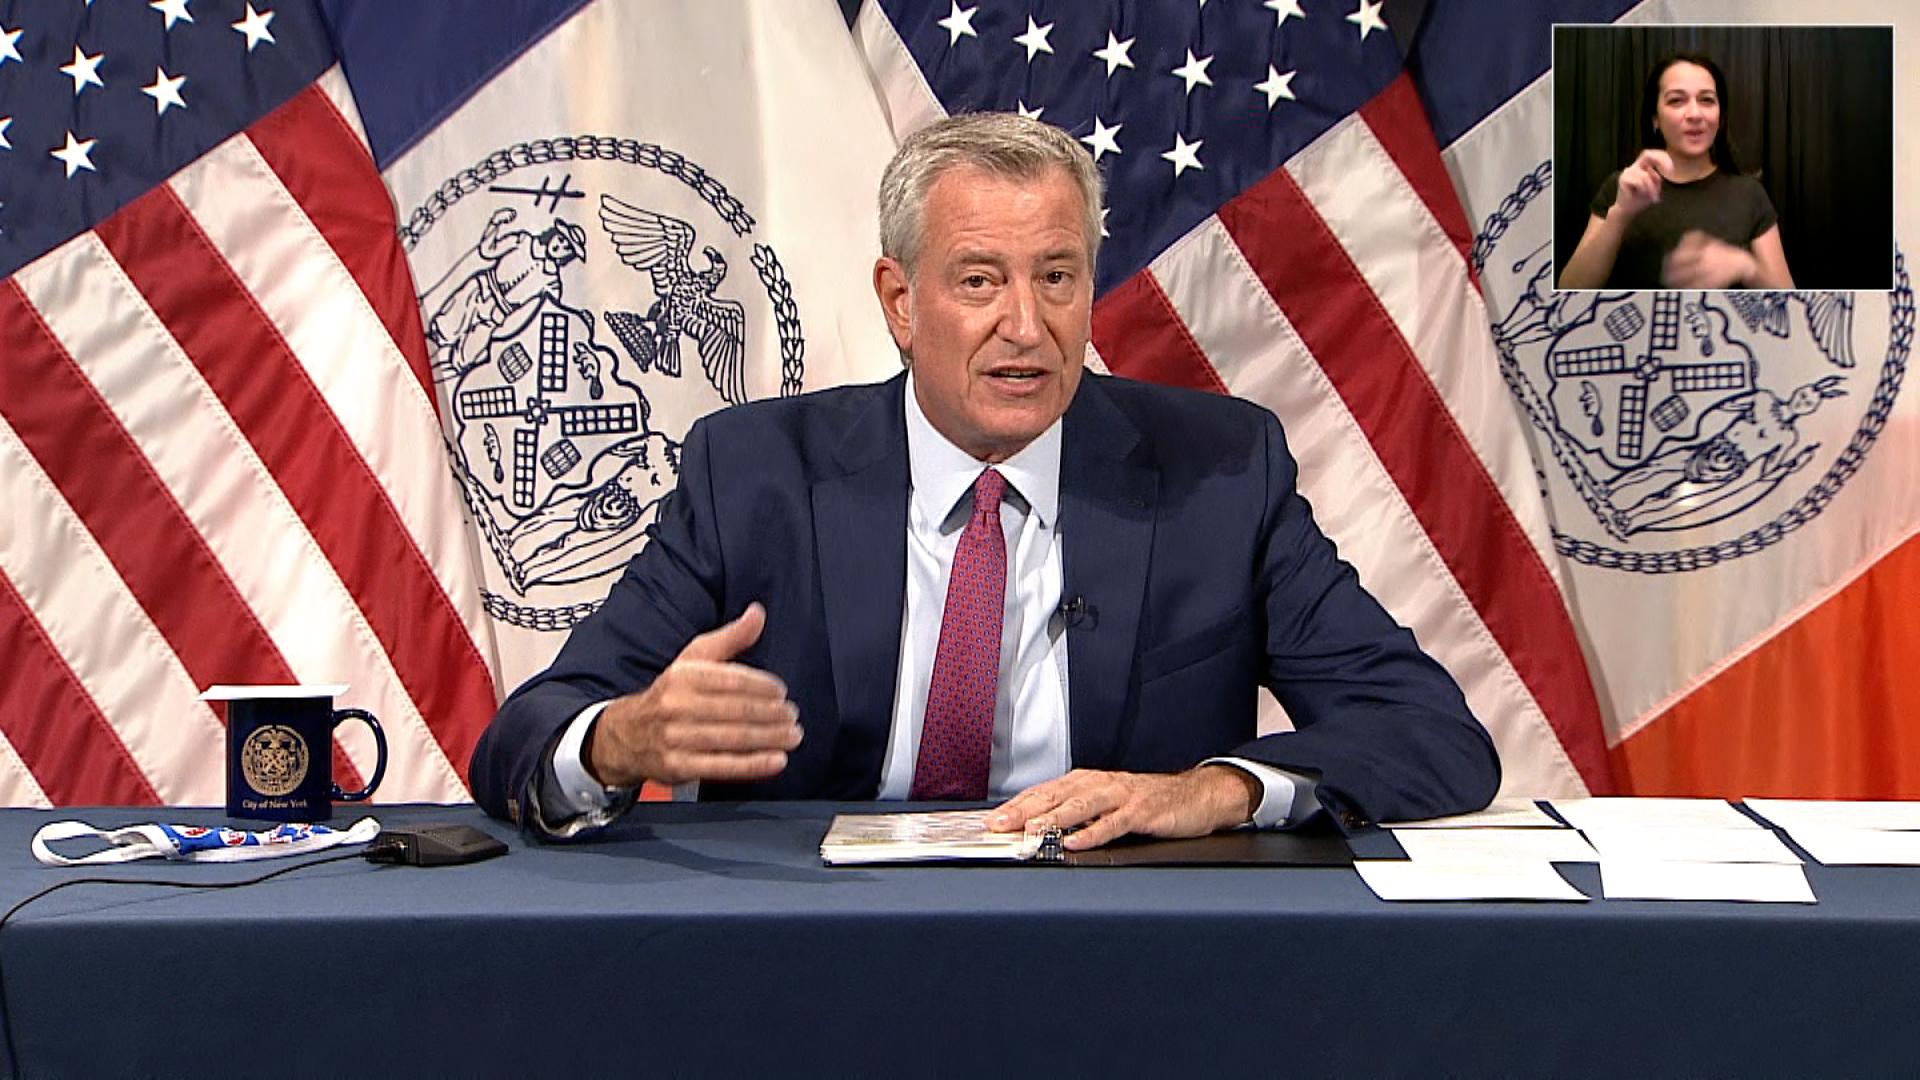 New York City Mayor Bill de Blasio speaks during a press briefing in New York on August 3.